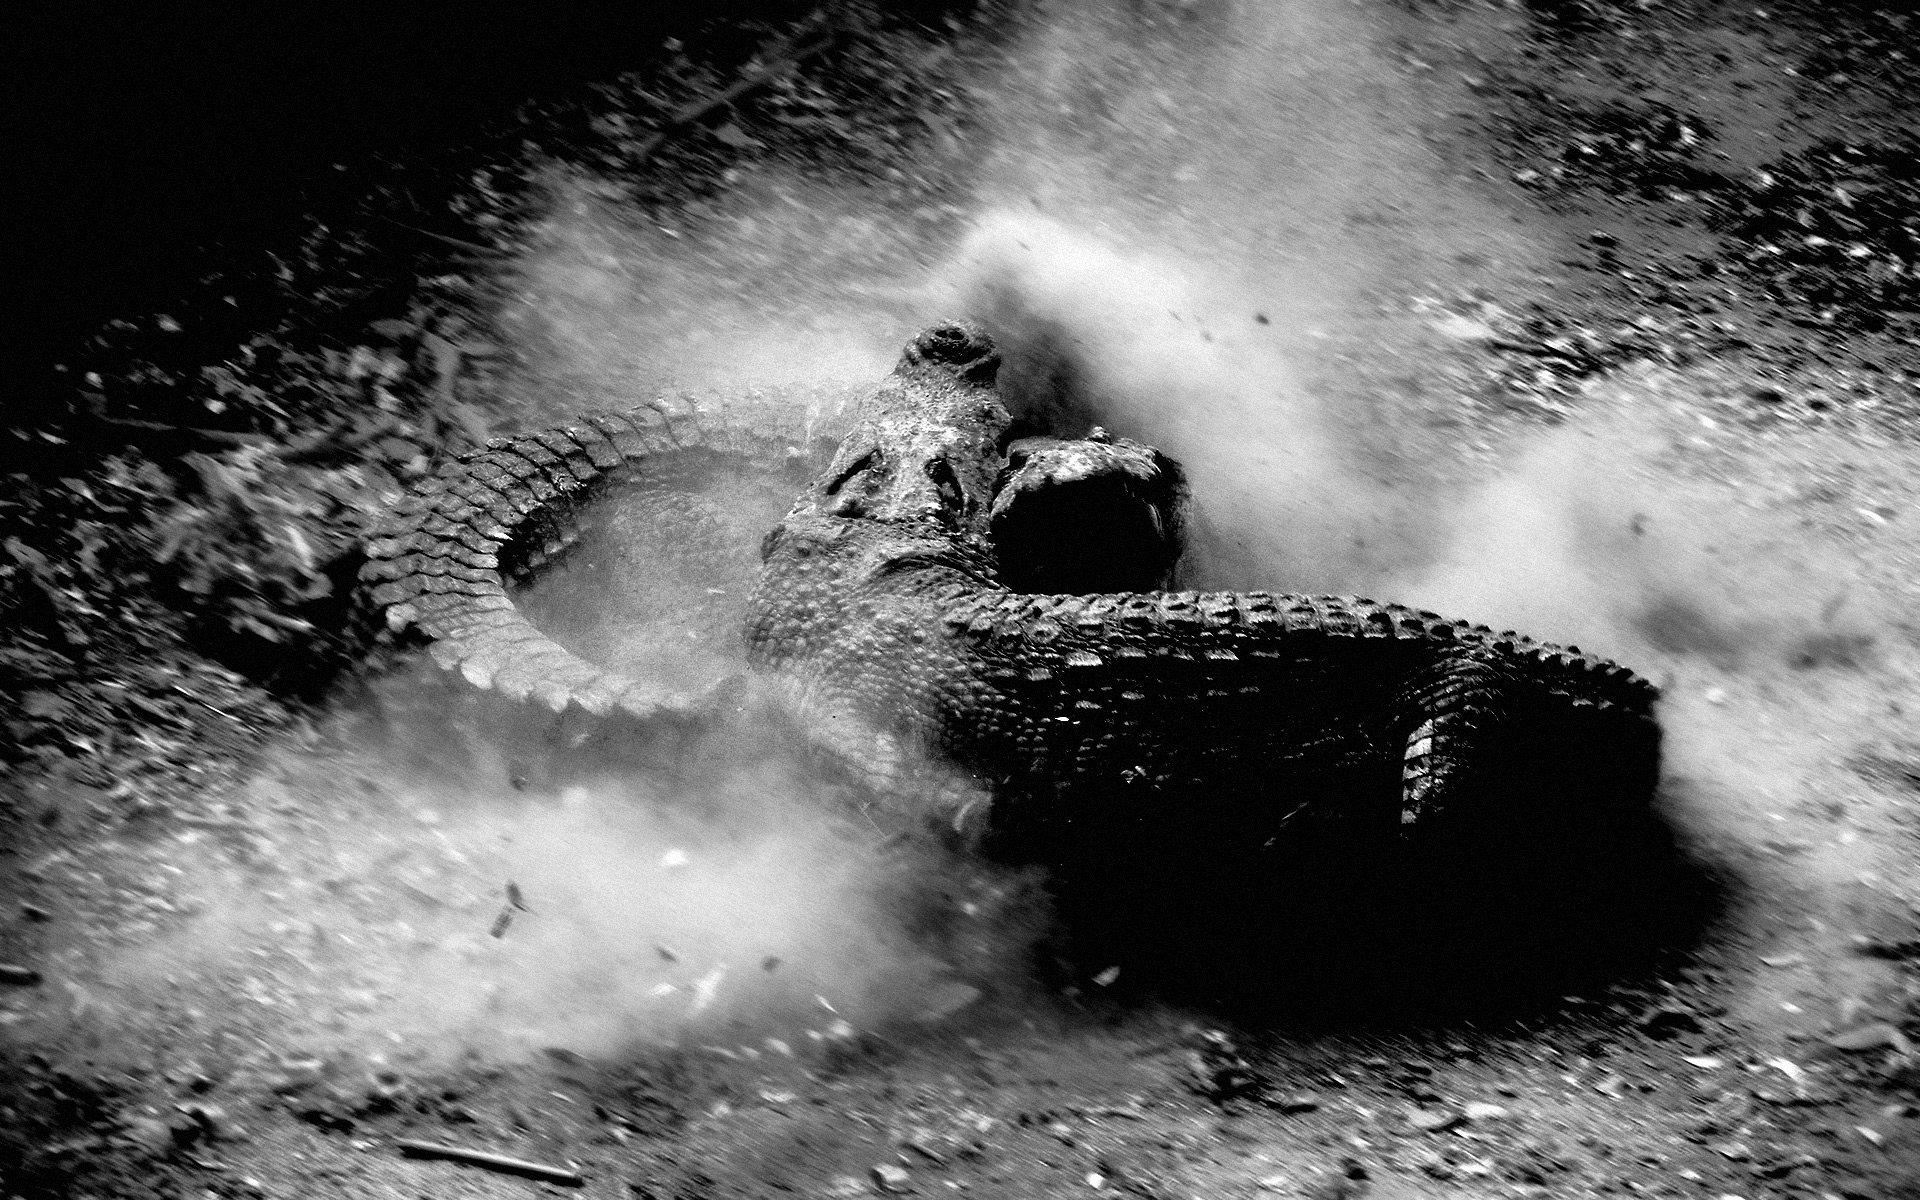 Crocodile Hd Wallpaper Background Image 1920x1200 Id